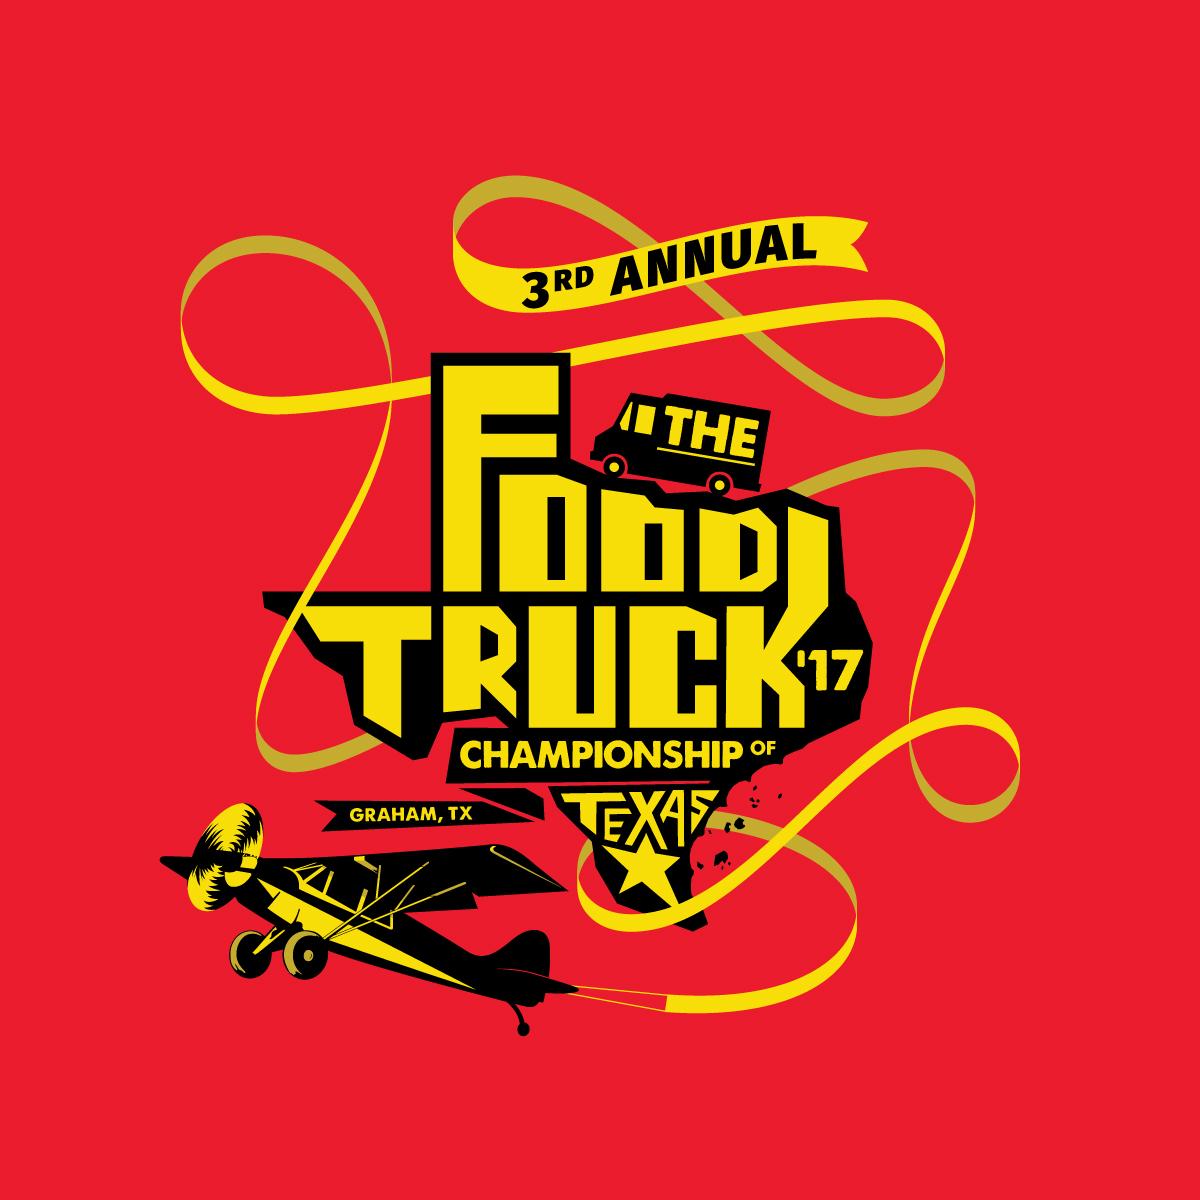 Food Truck Championship of Texas shirt